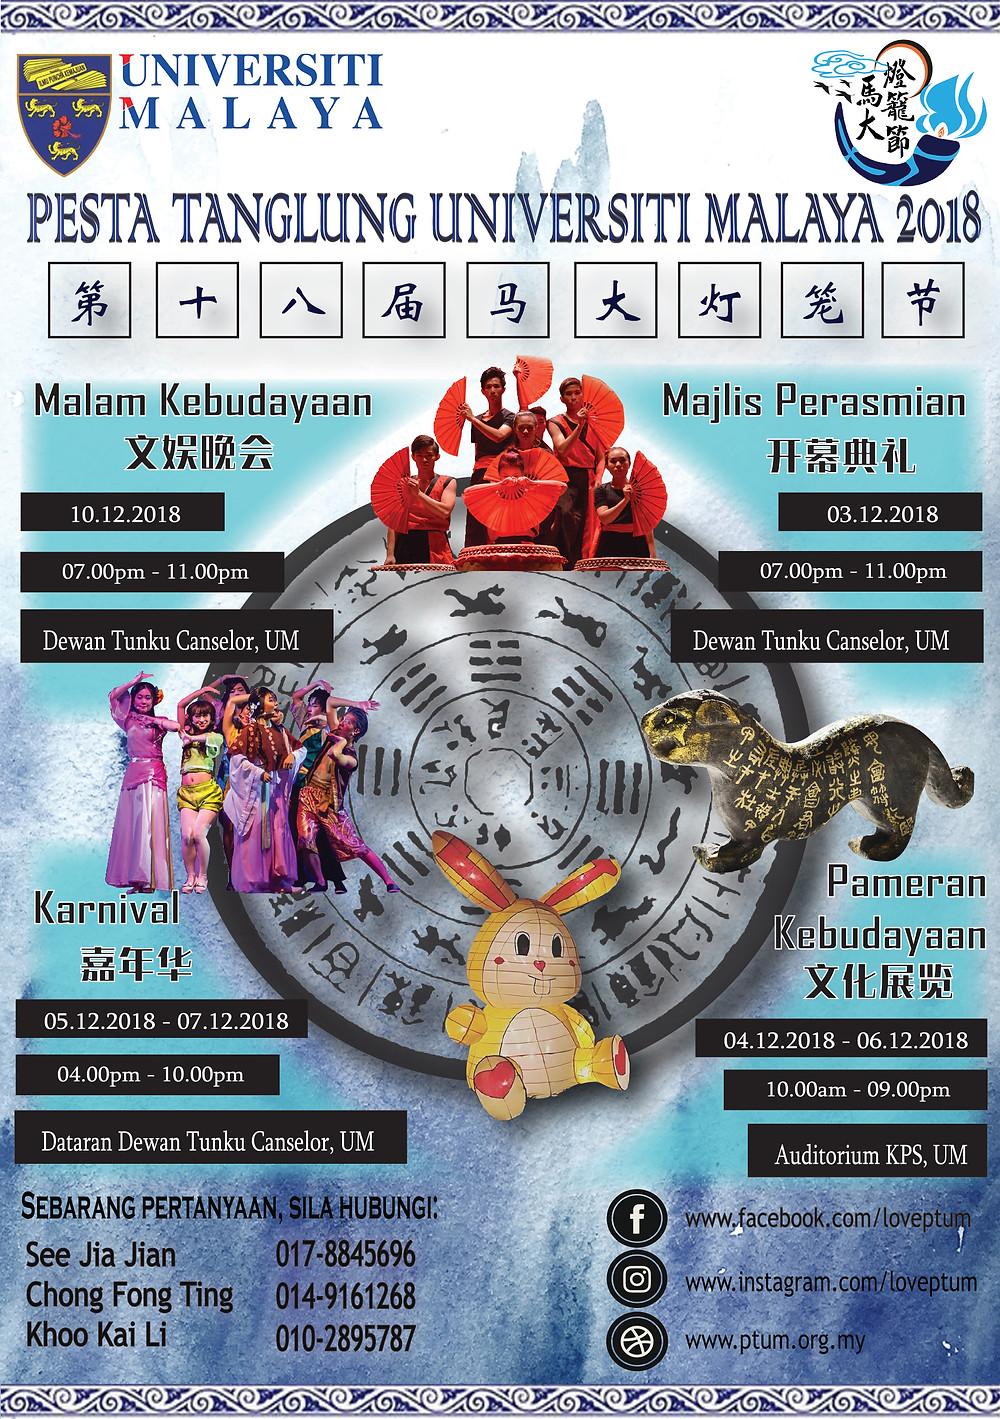 Jantzen Sponsorship Pesta Tanglung Universiti Malaya 2018